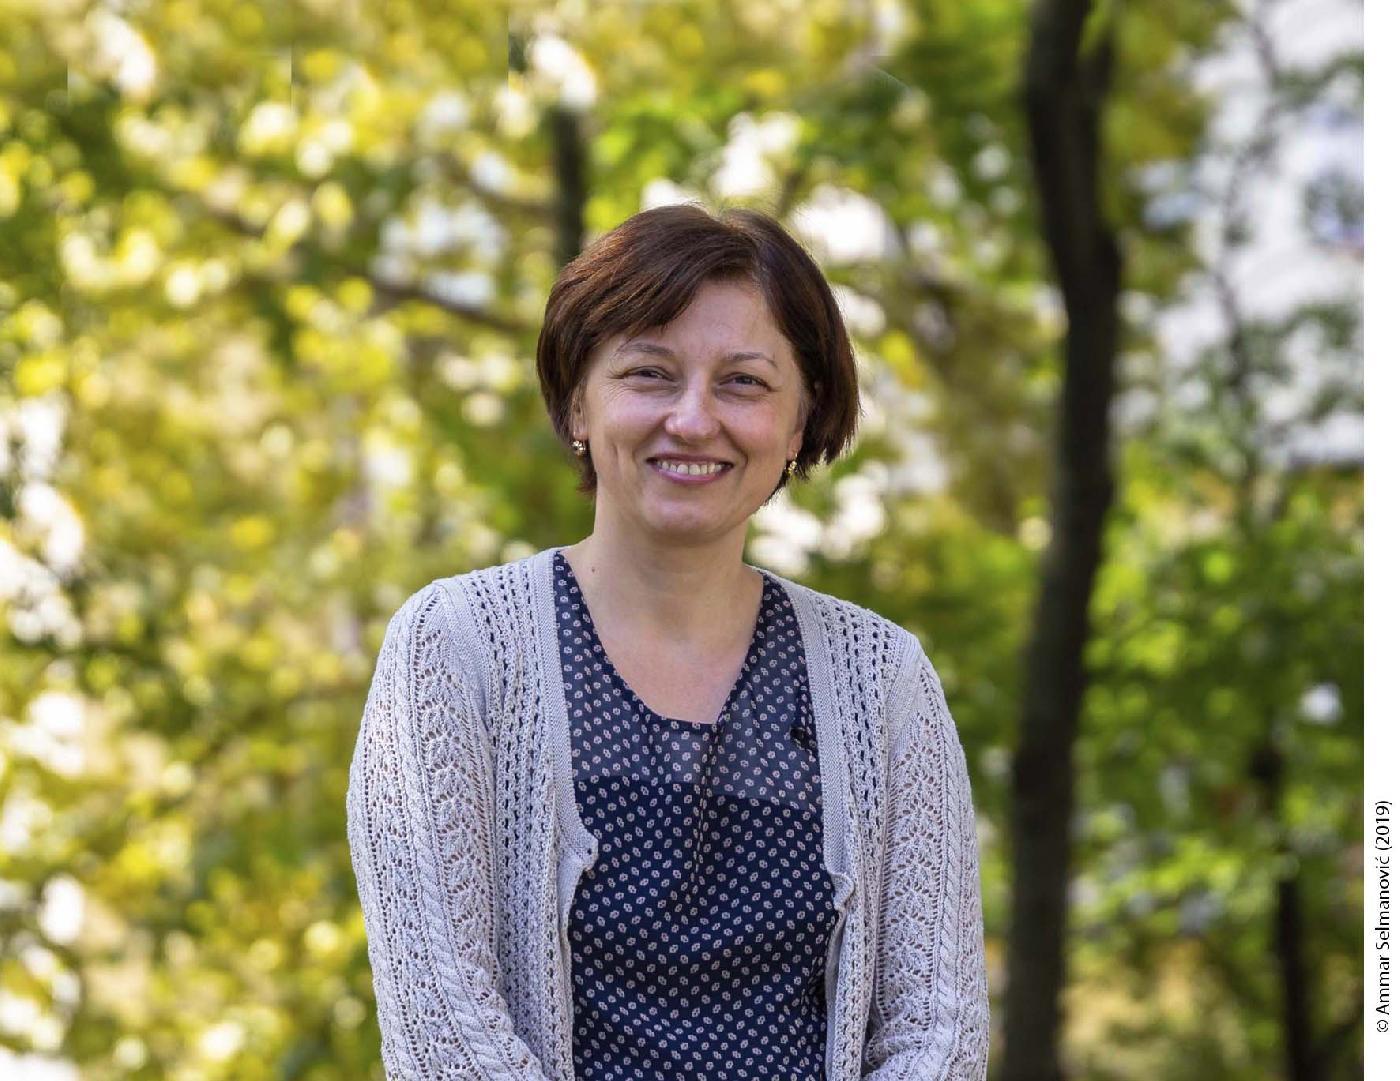 Amela Čolić, PhD. Vice-Rector for Research and International Relations at University of Bihać